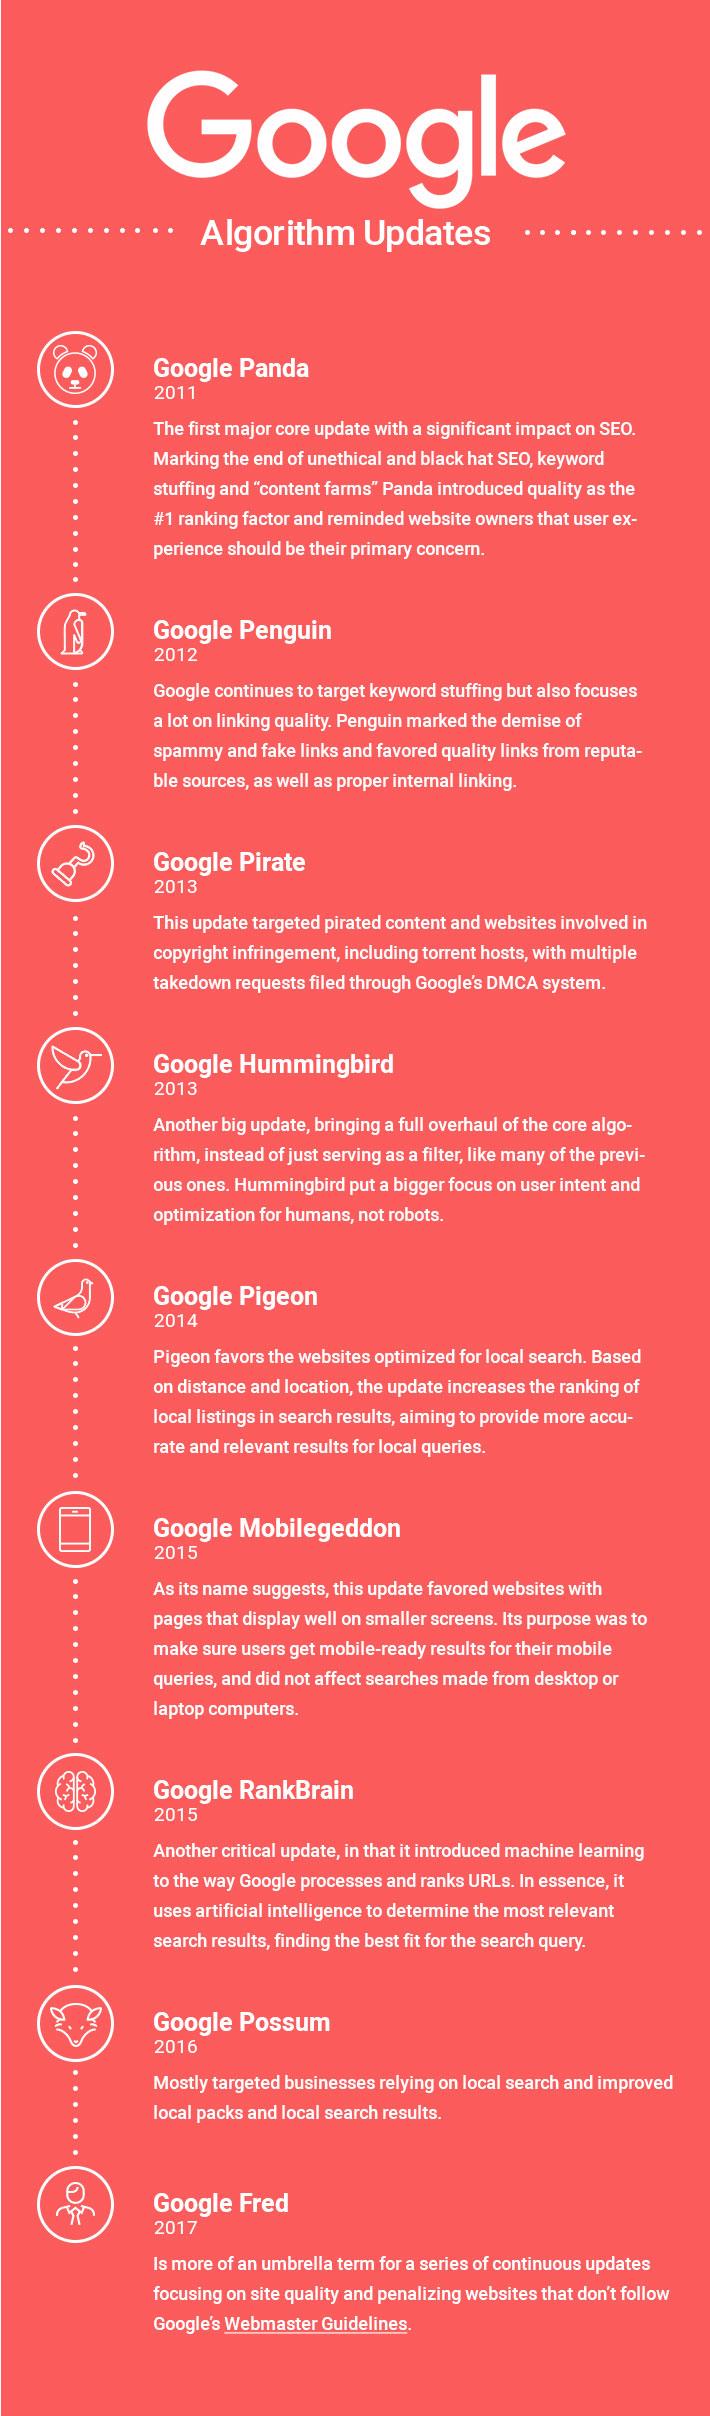 Important Google Algorithm Updates